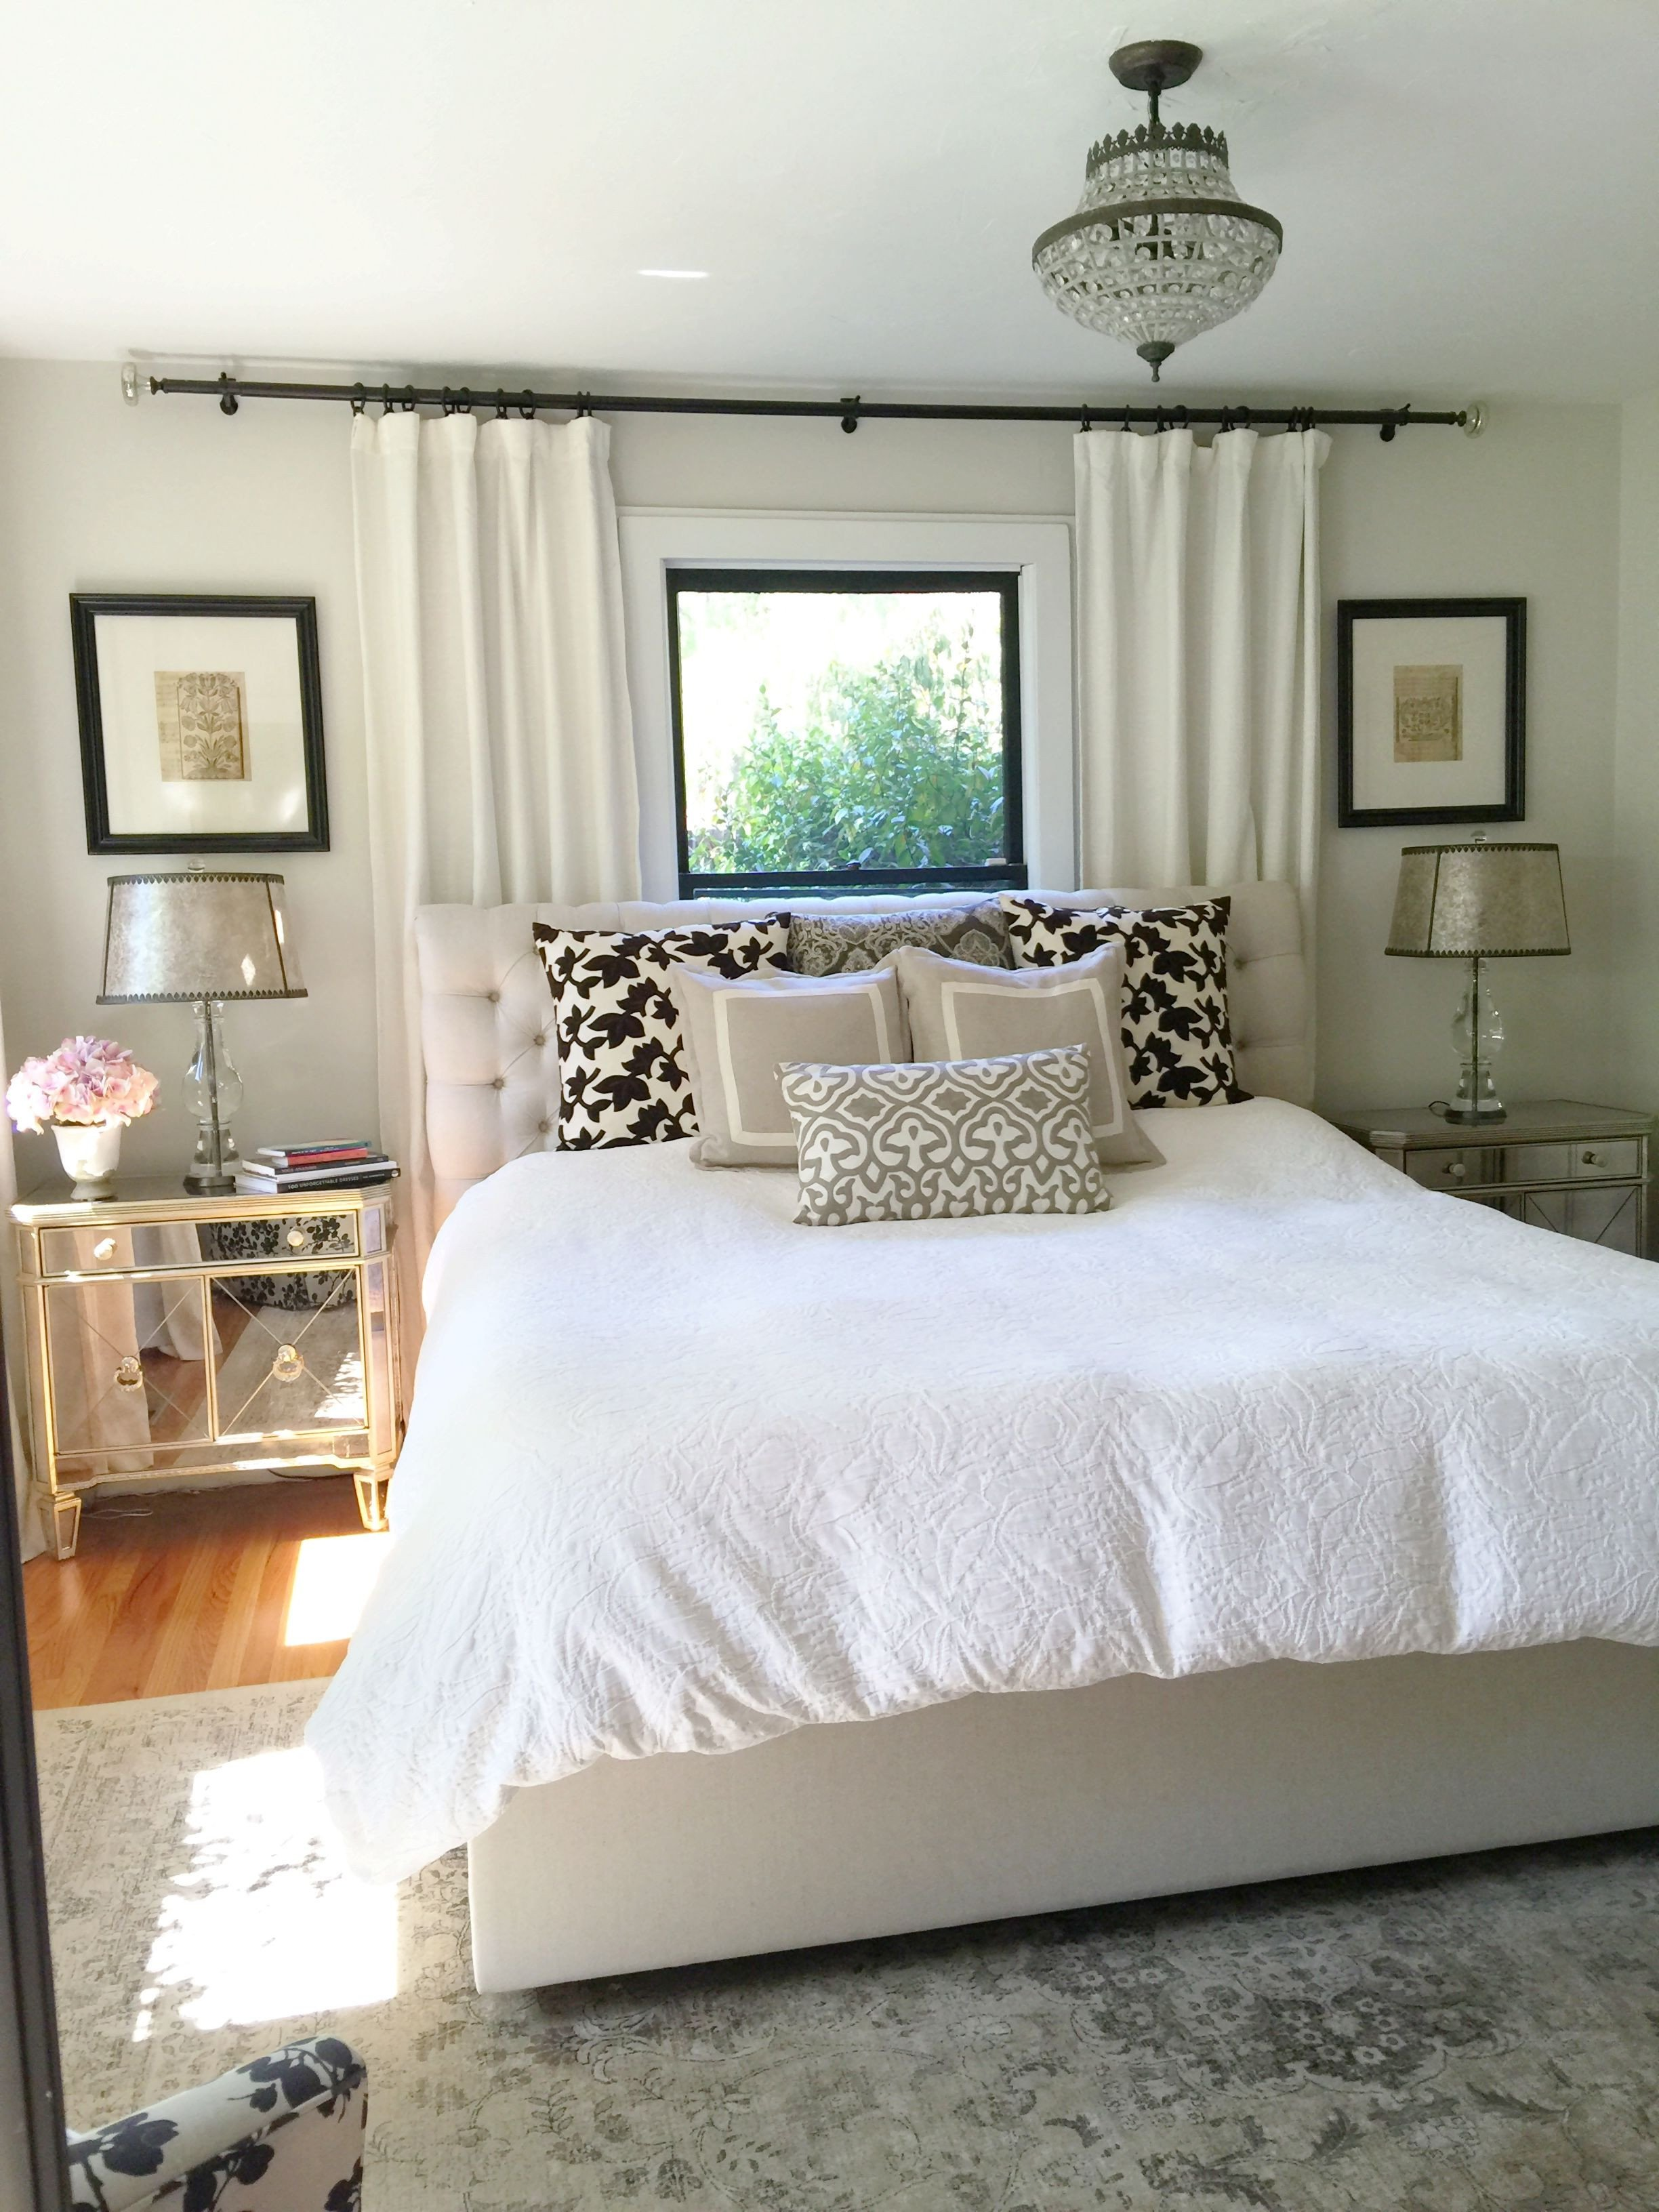 Bedroom Bedding and Curtain Set Inspirational Neutral Bedroom Window Behind Bed Bedroom Window